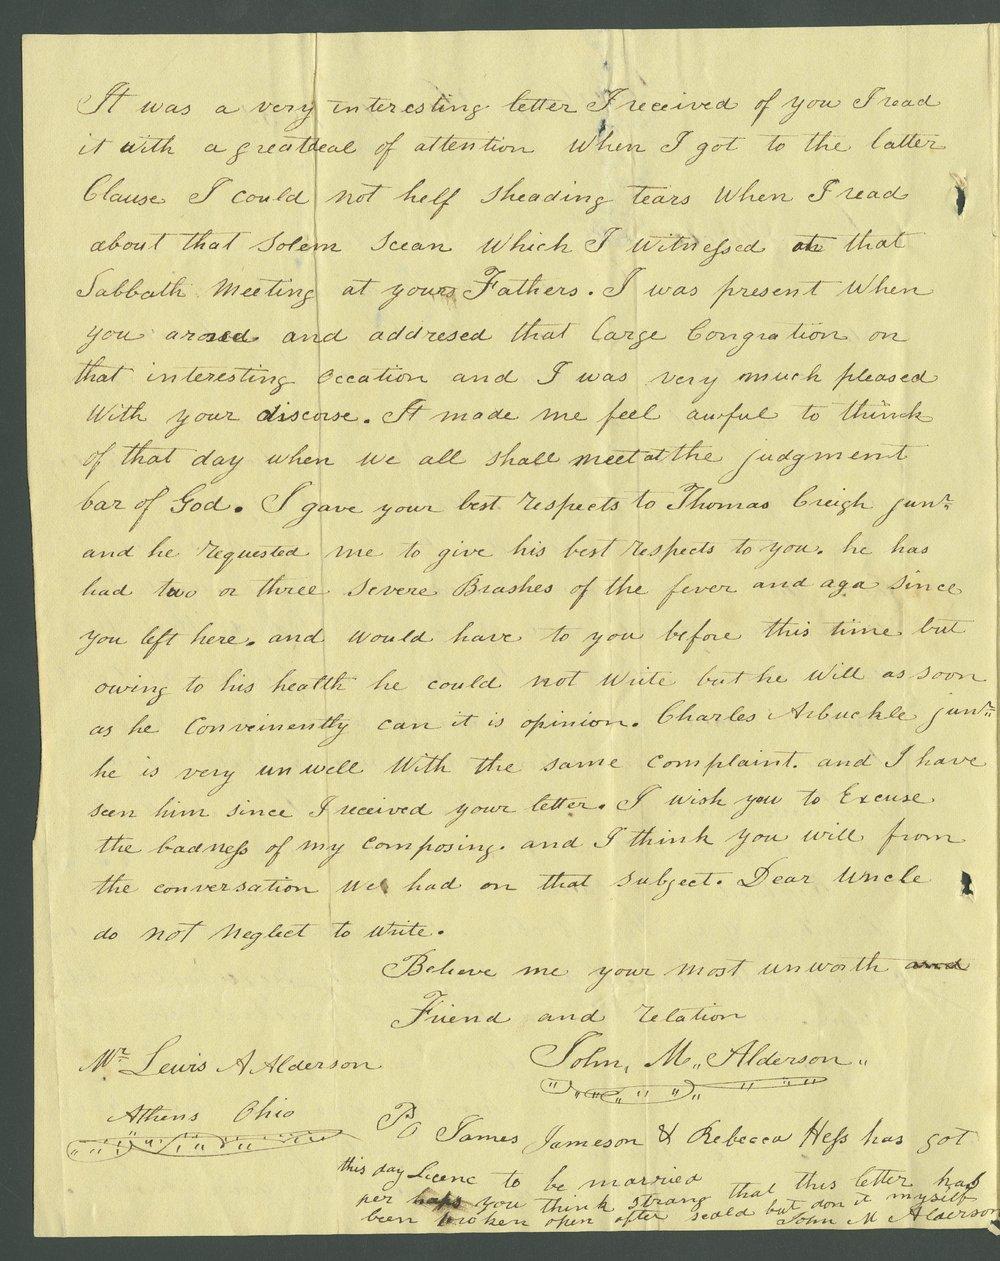 John M. Alderson to Lewis Allen Alderson - 7